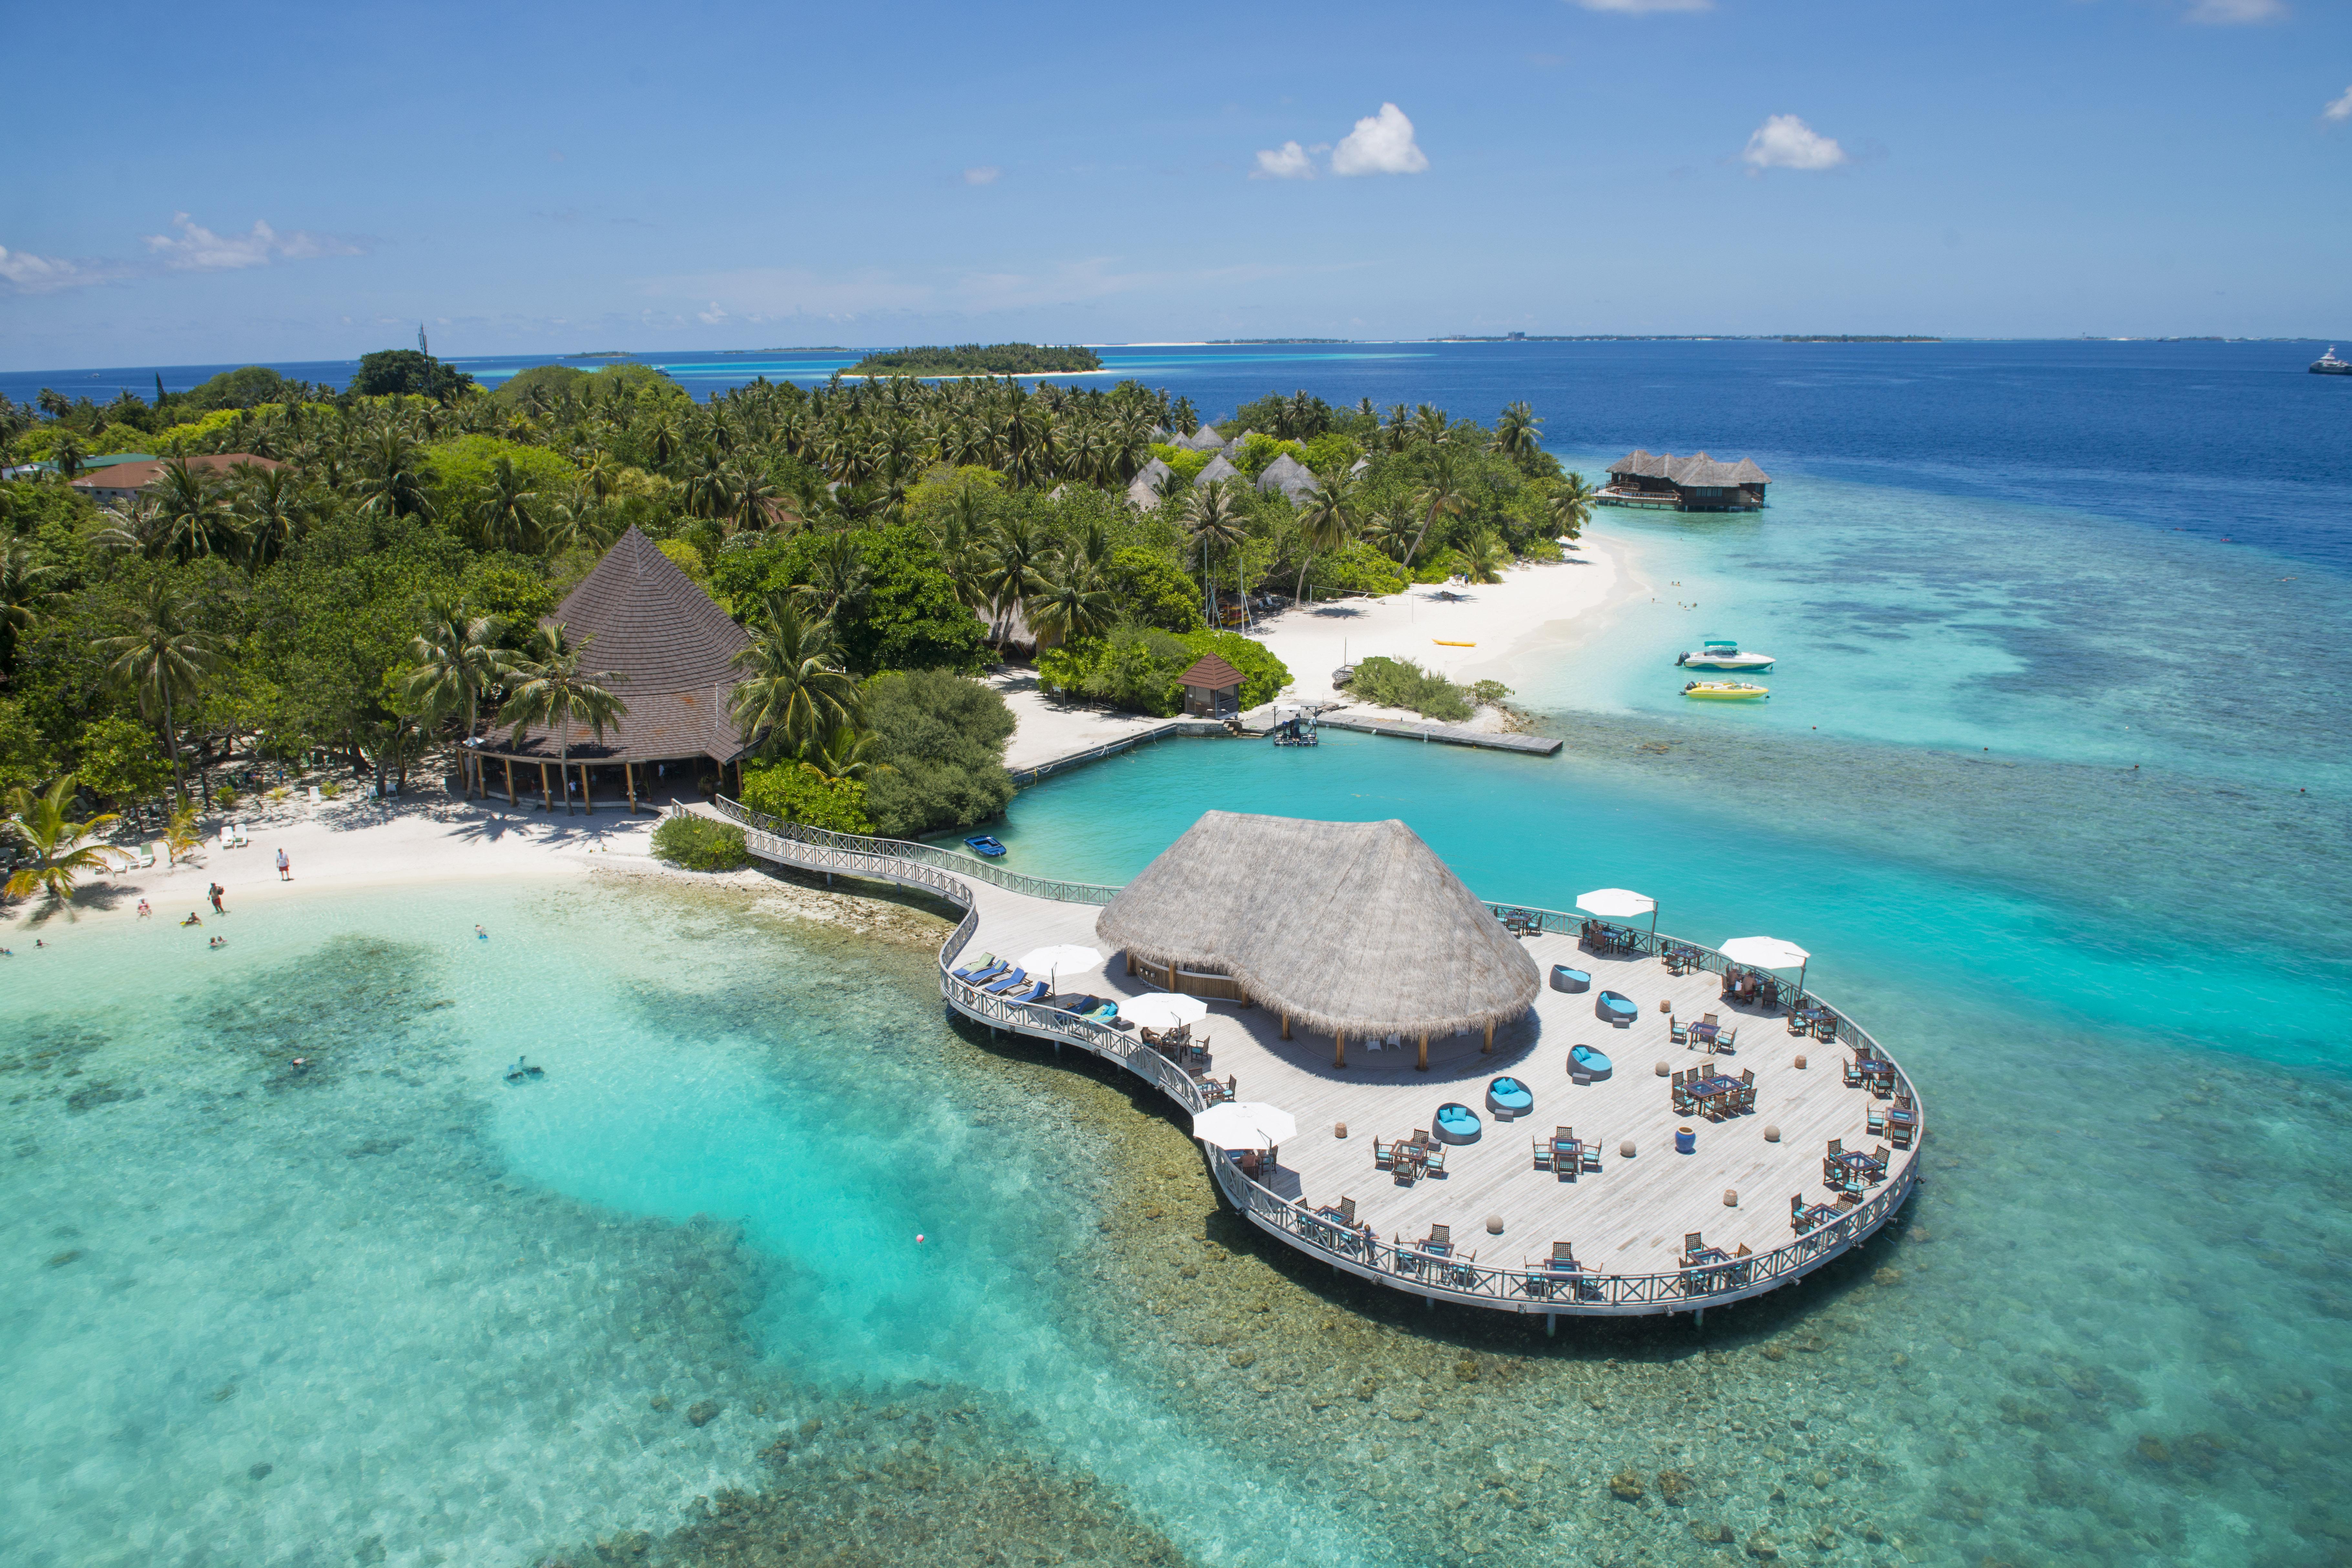 Bandos Maldives Stay Islands